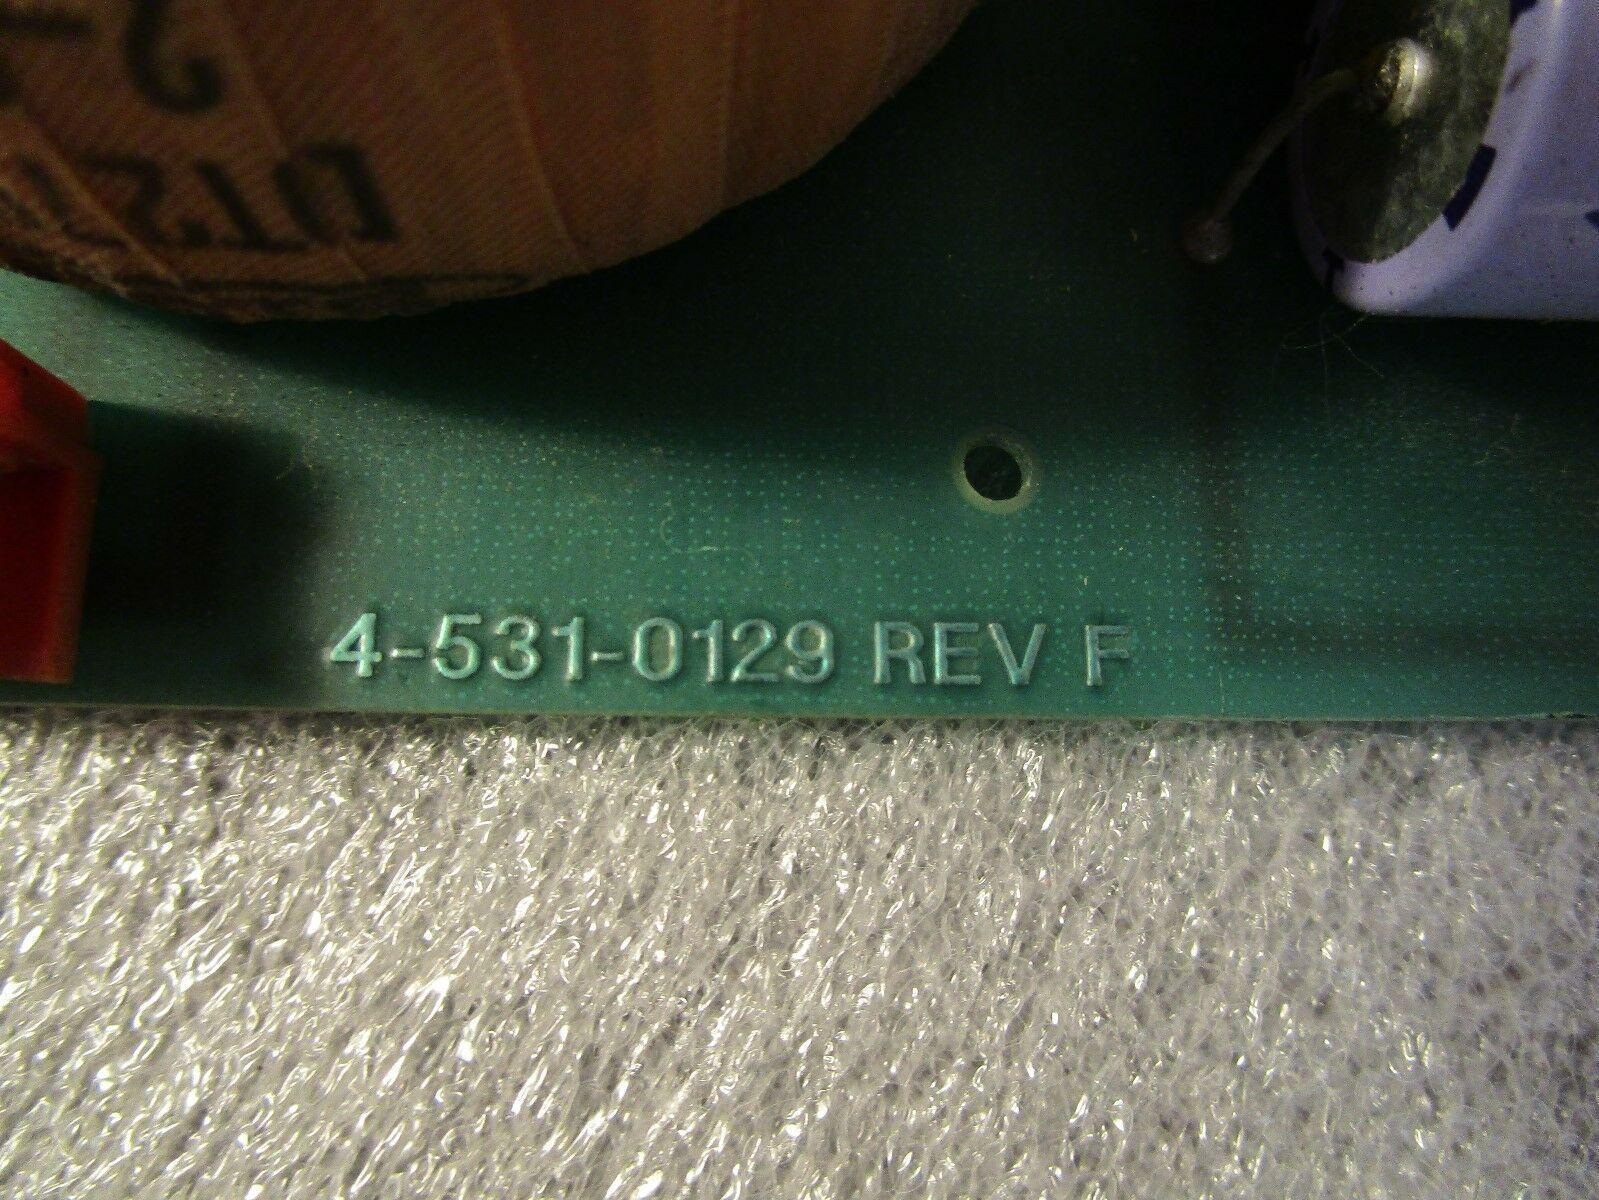 Cincinnati Acramatic IO board 4-531-0129 Rev F